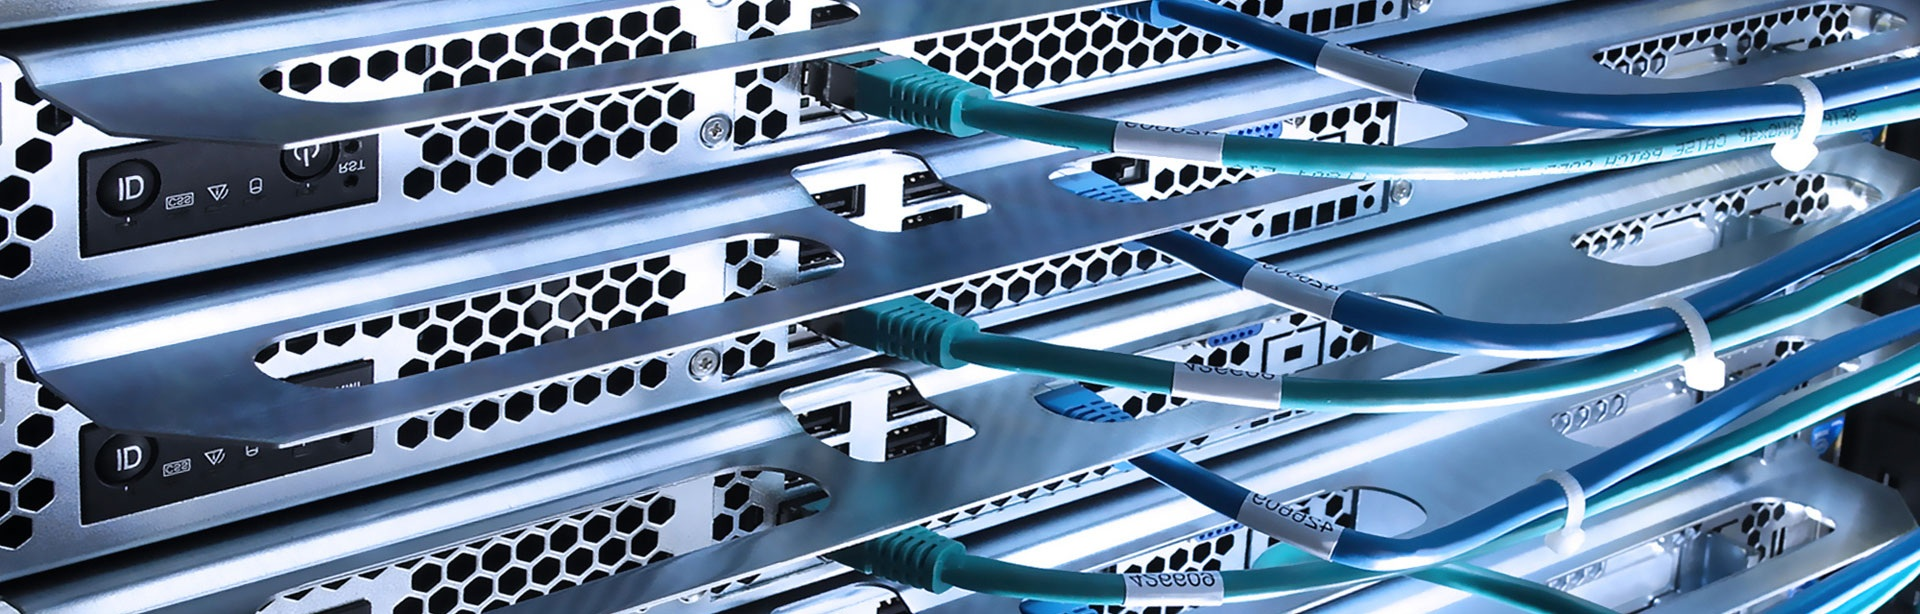 Saint Martinville Louisiana Trusted Voice & Data Network Cabling Provider